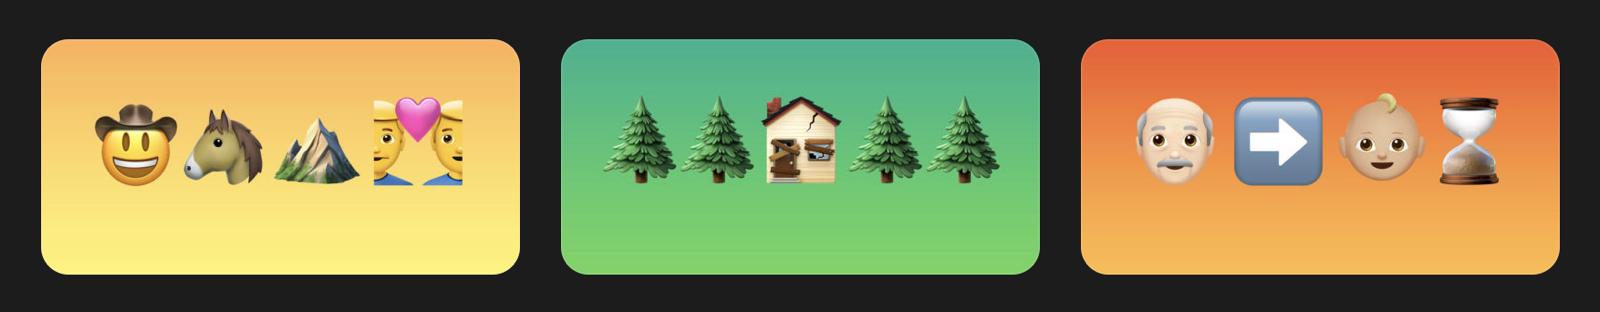 Image of iTunes movies in emojis.